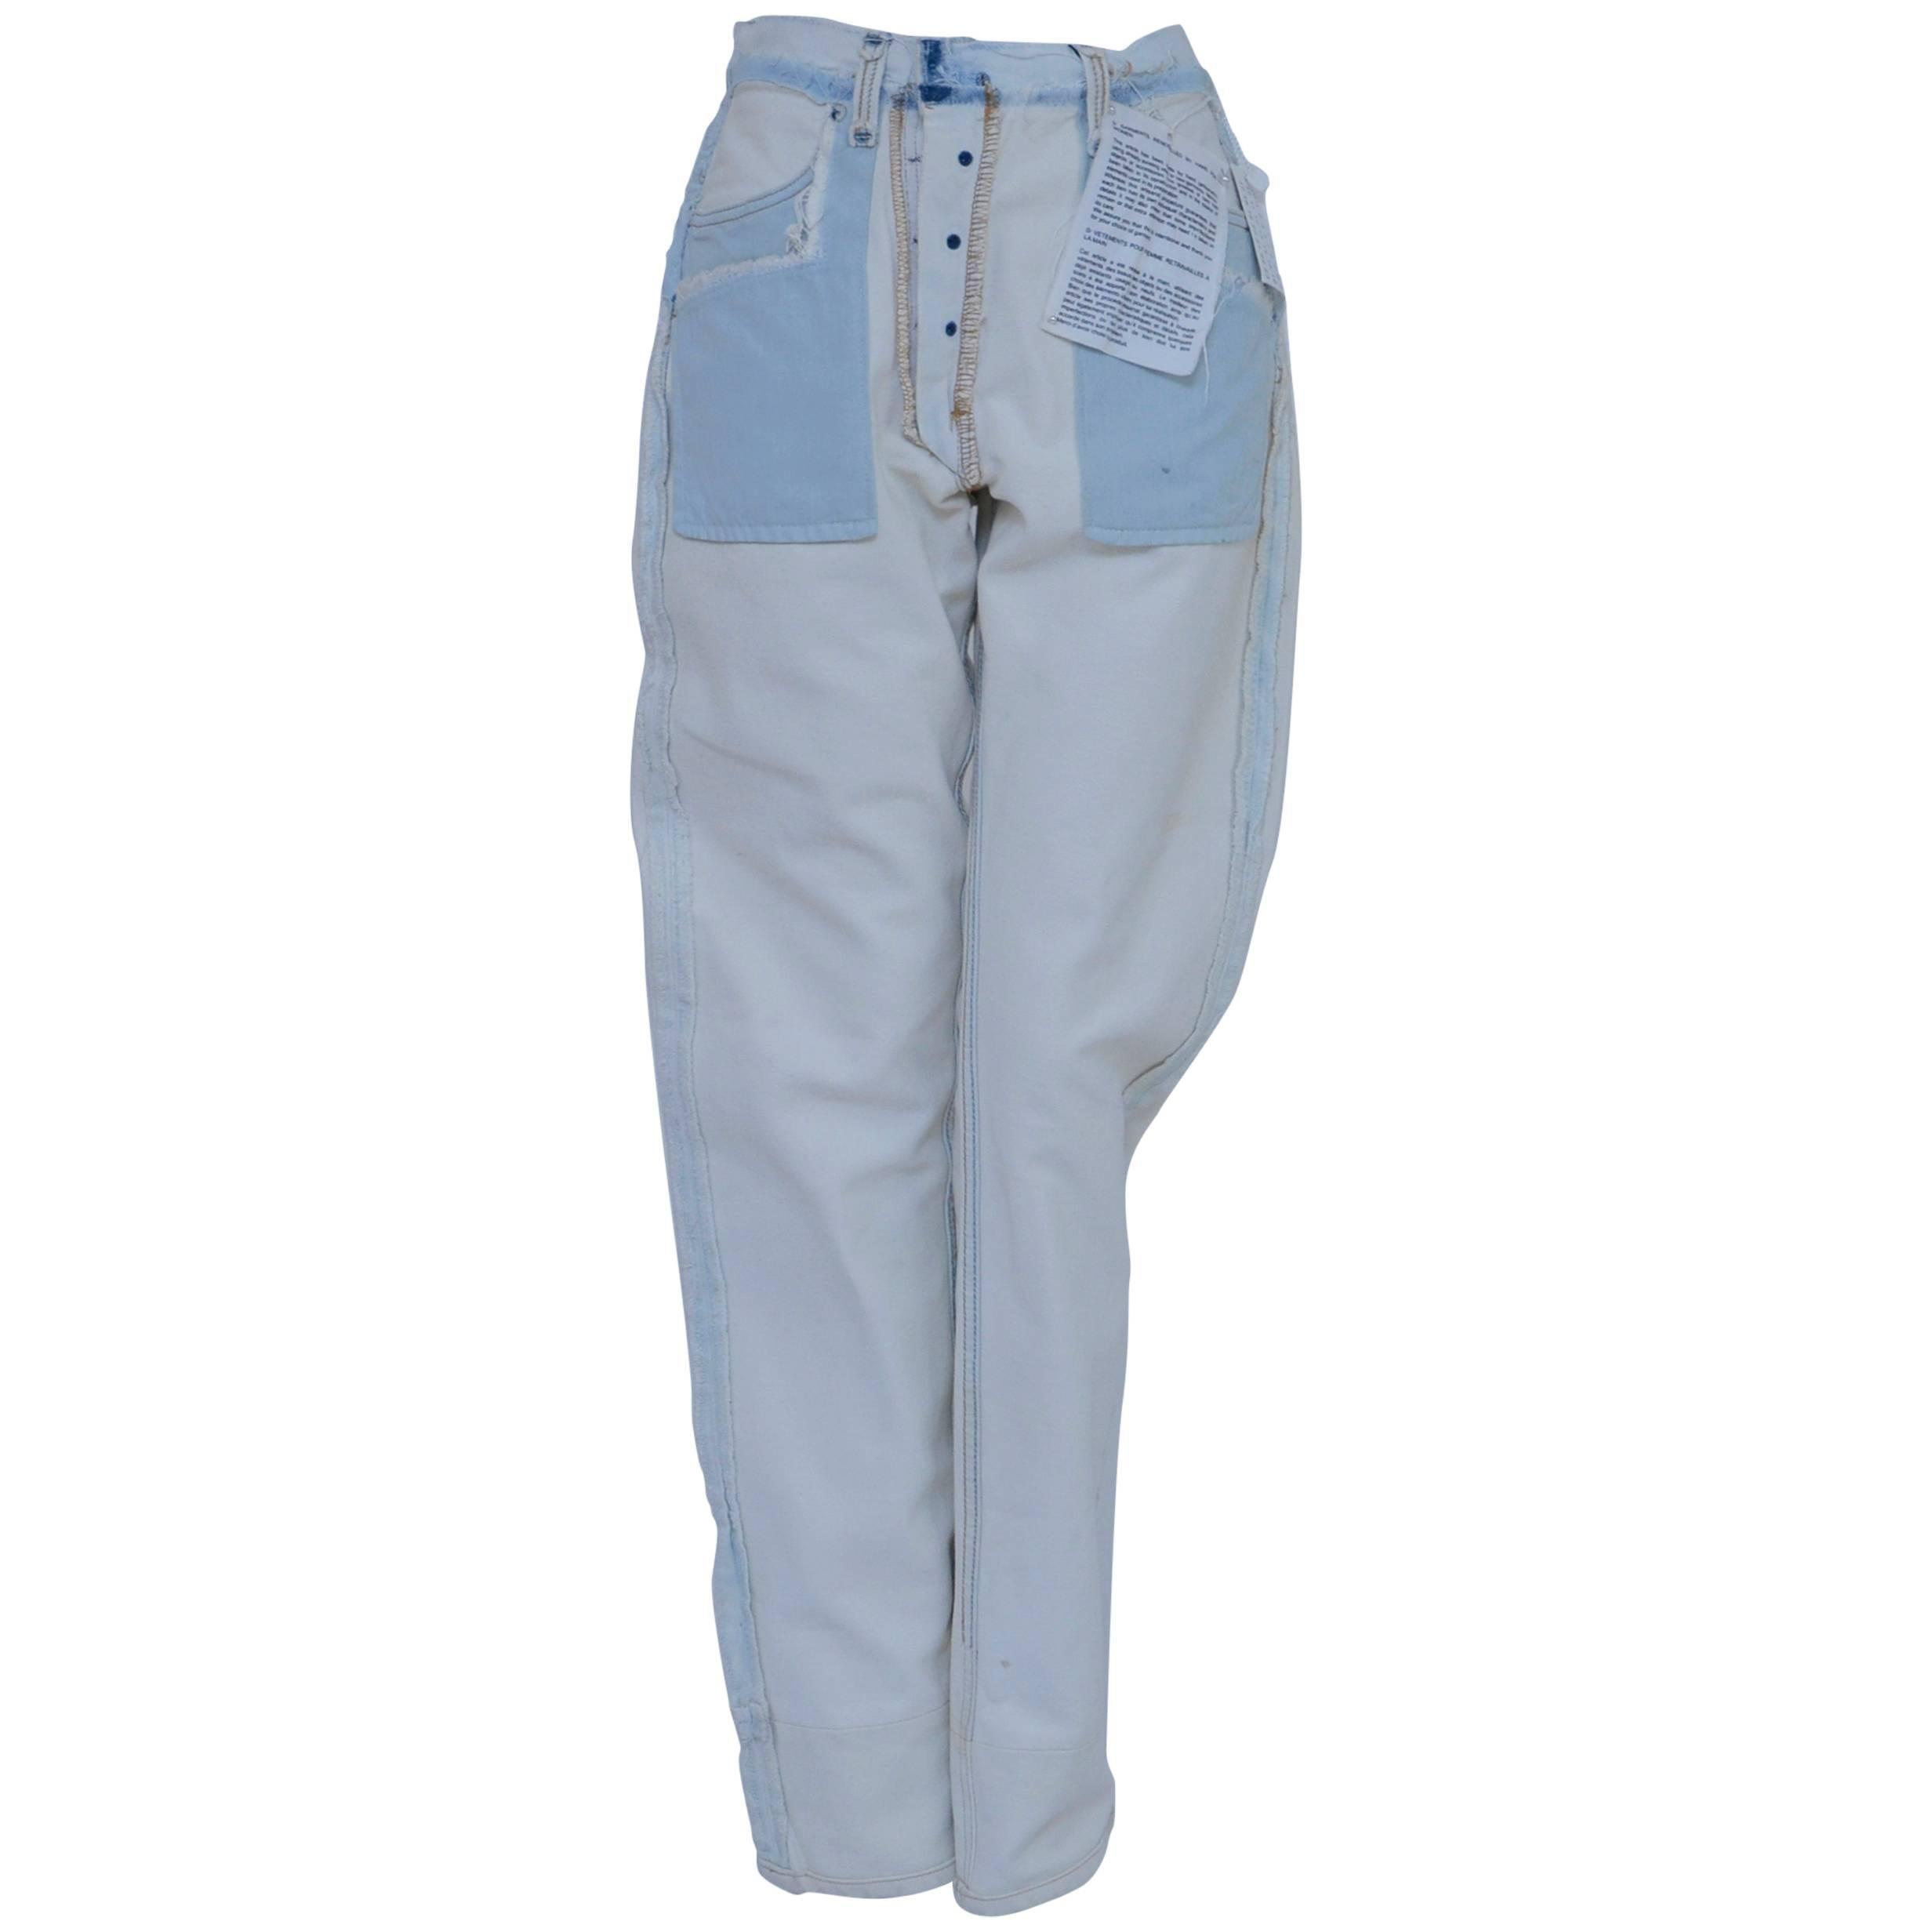 Maison Martin Margiela Artisanal Remodeled By Hand Denim Jeans  New  Size# 2